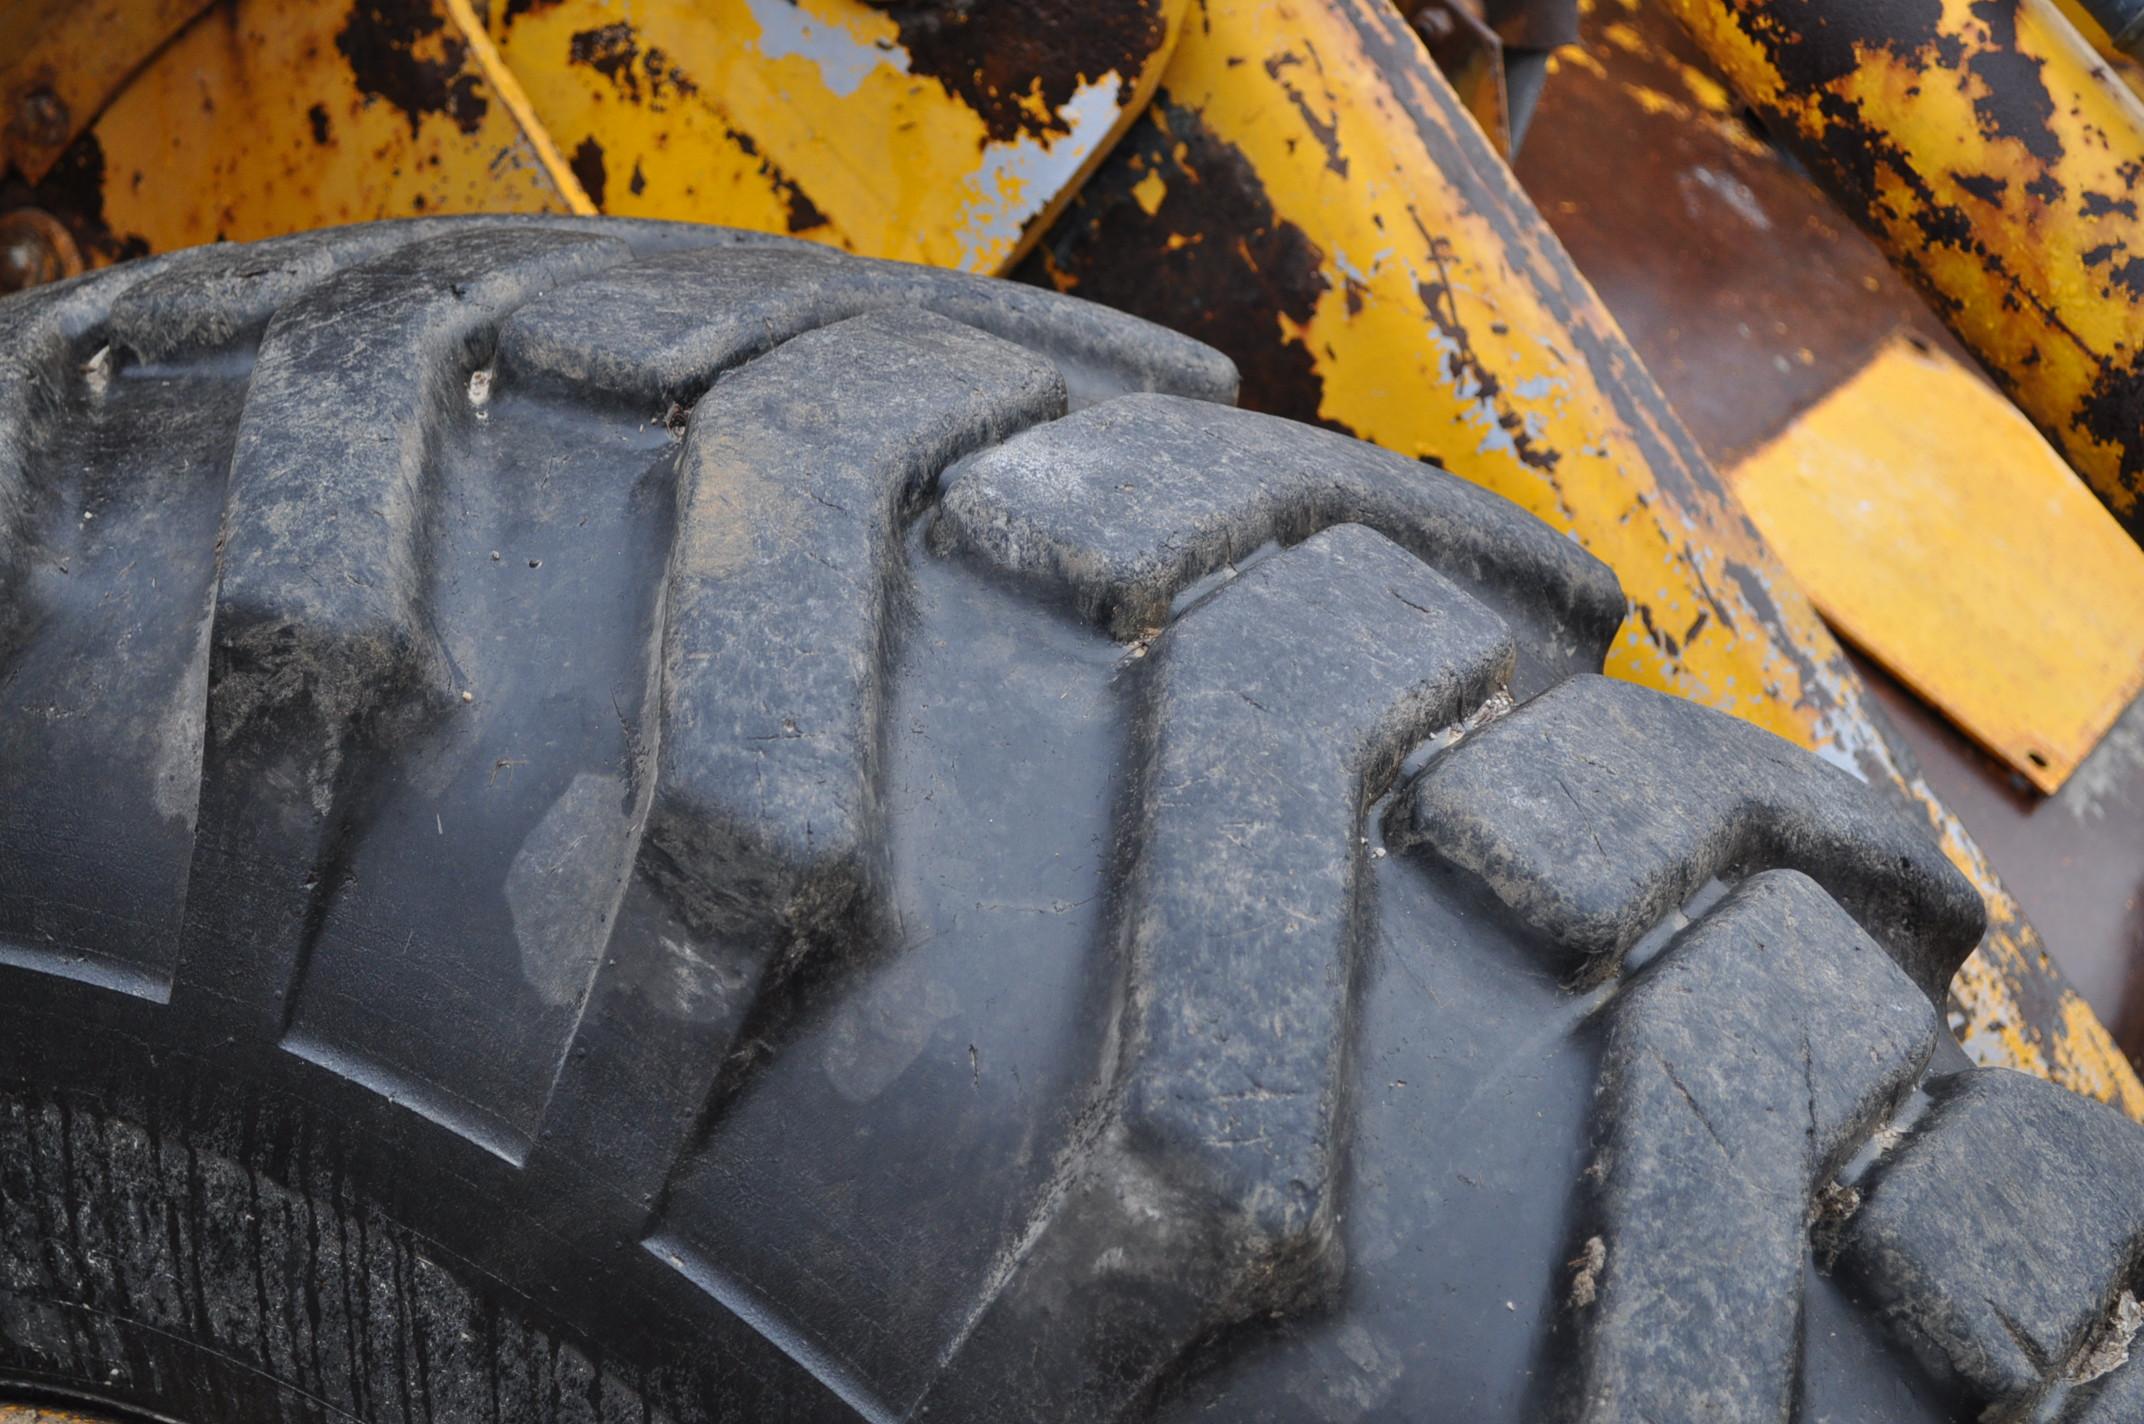 John Deere 544 Payloader, 17.5-25 tires, shows 1074 hrs, SN 0767621 - Image 9 of 16